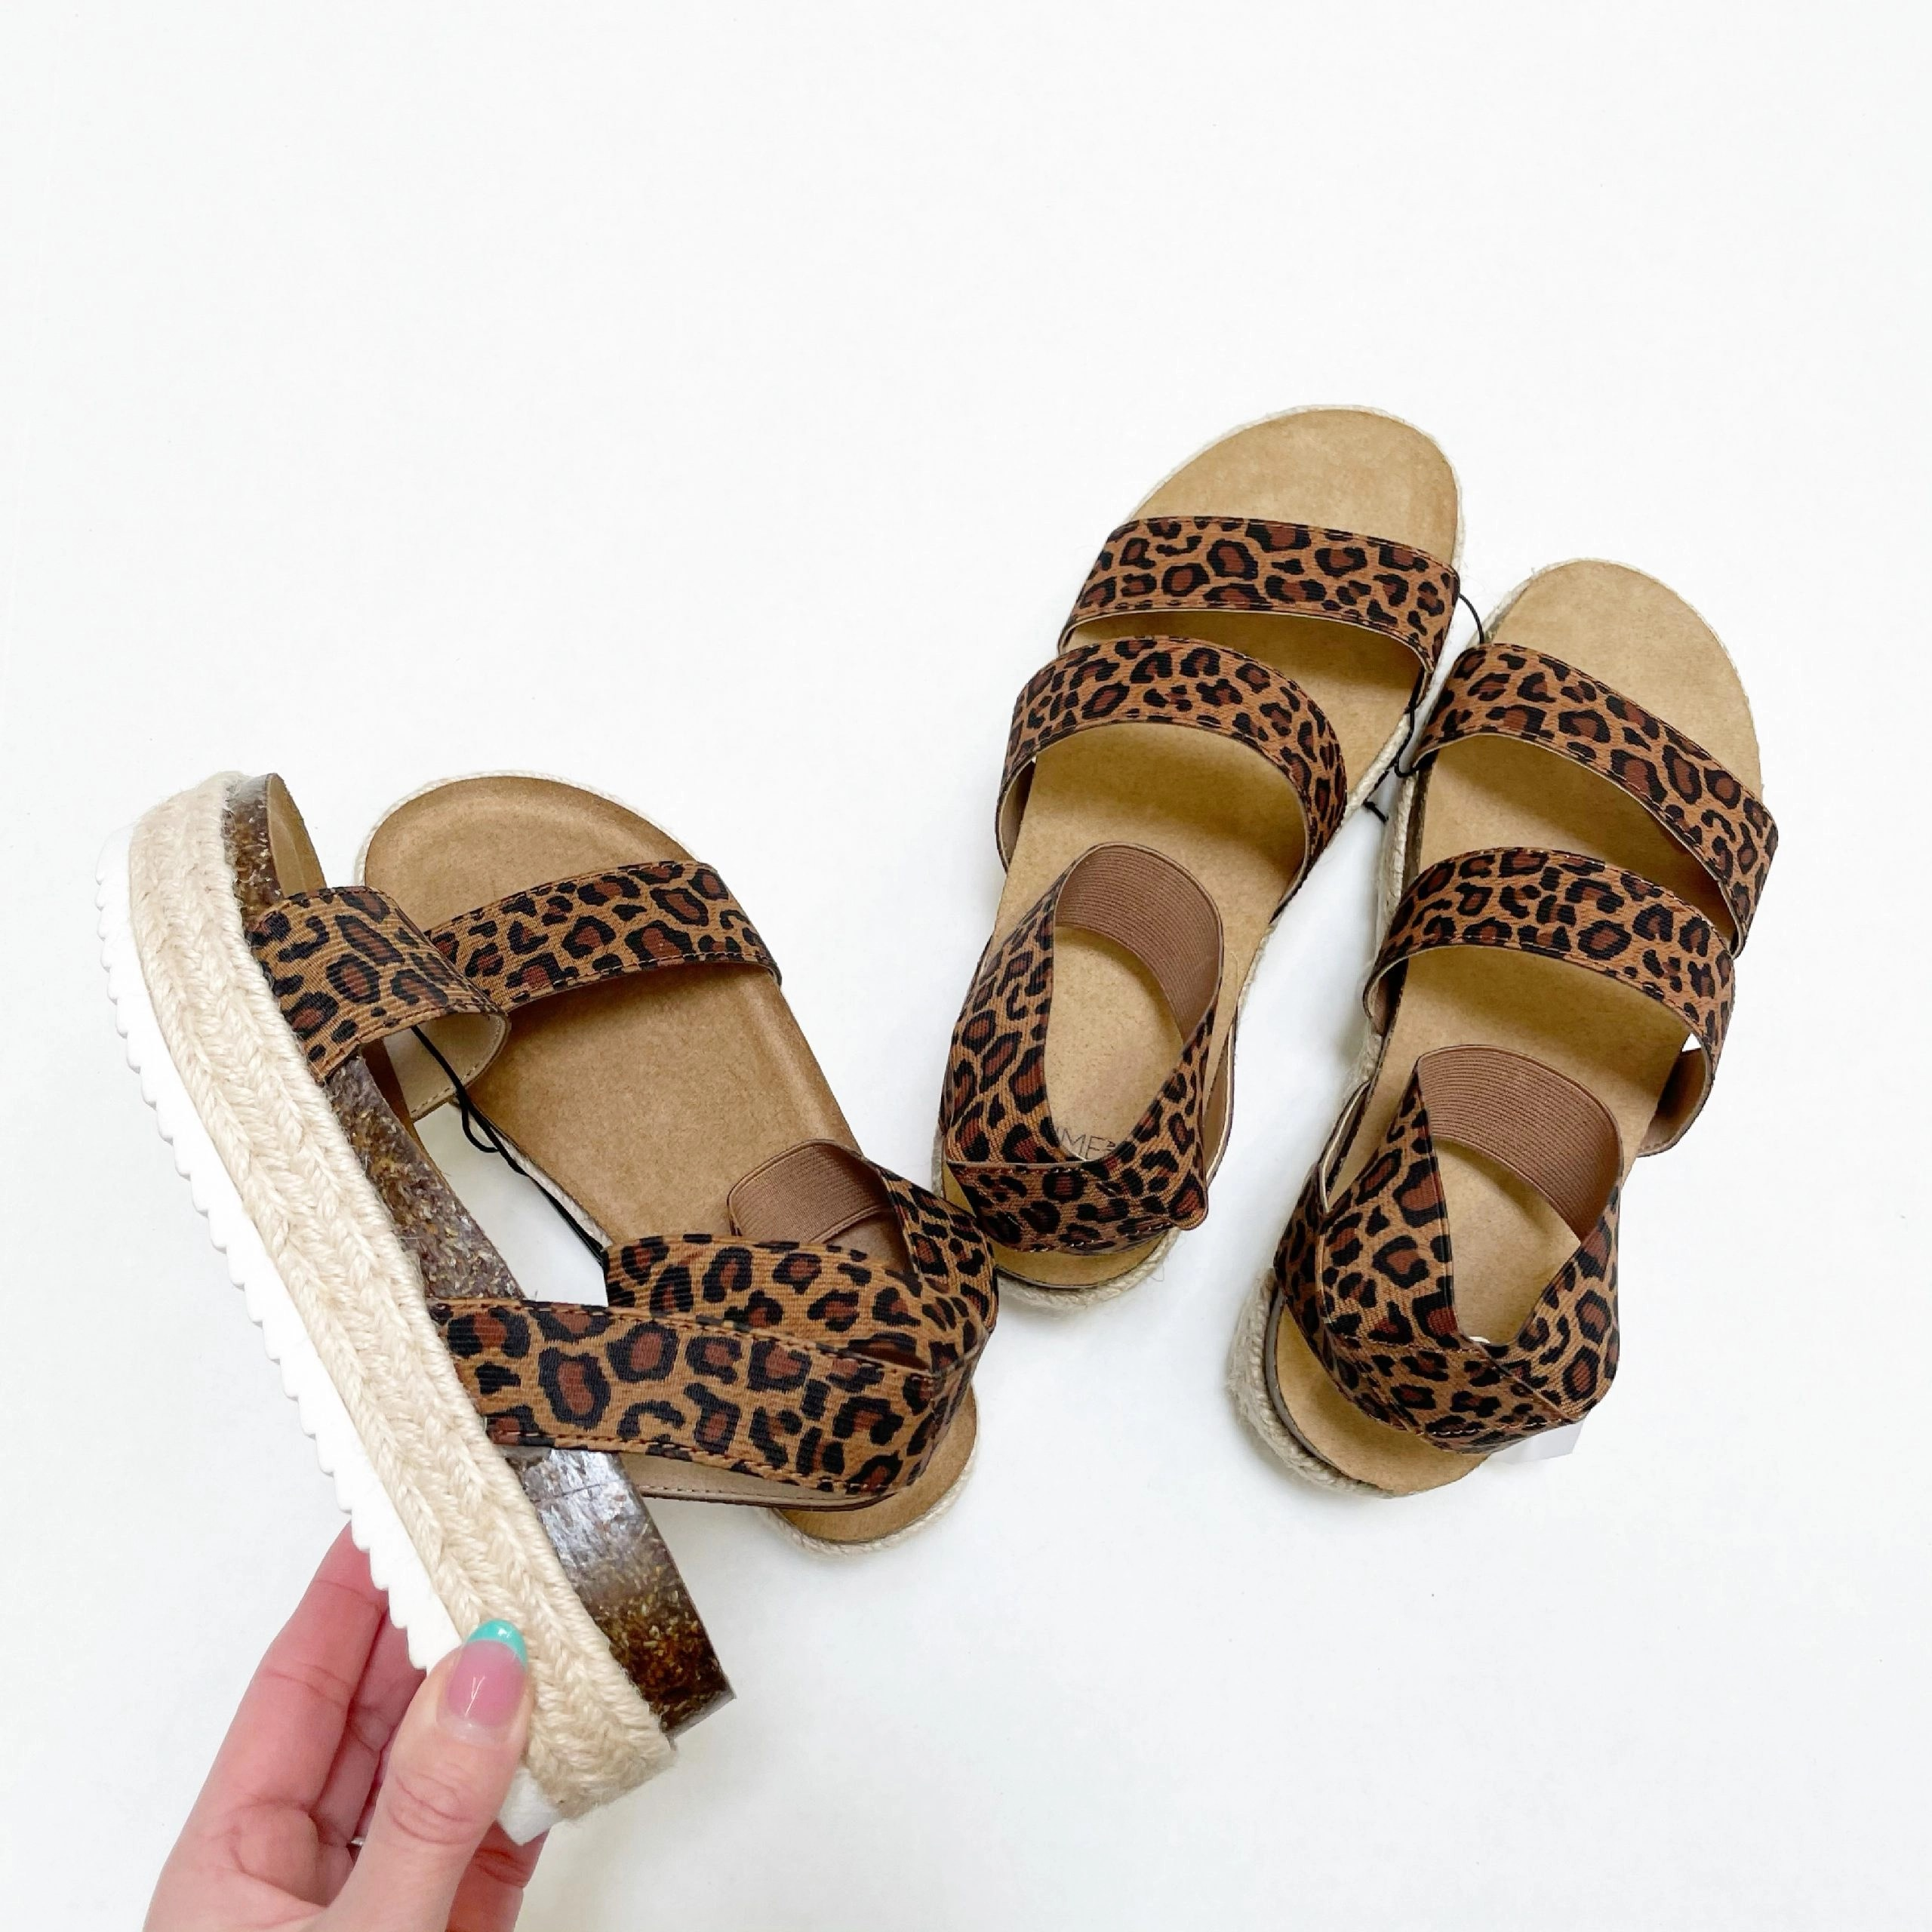 Mommy & Me Matching Sandals - Time and Tru + Wonder Nation Leopard Print Flatform Sandals